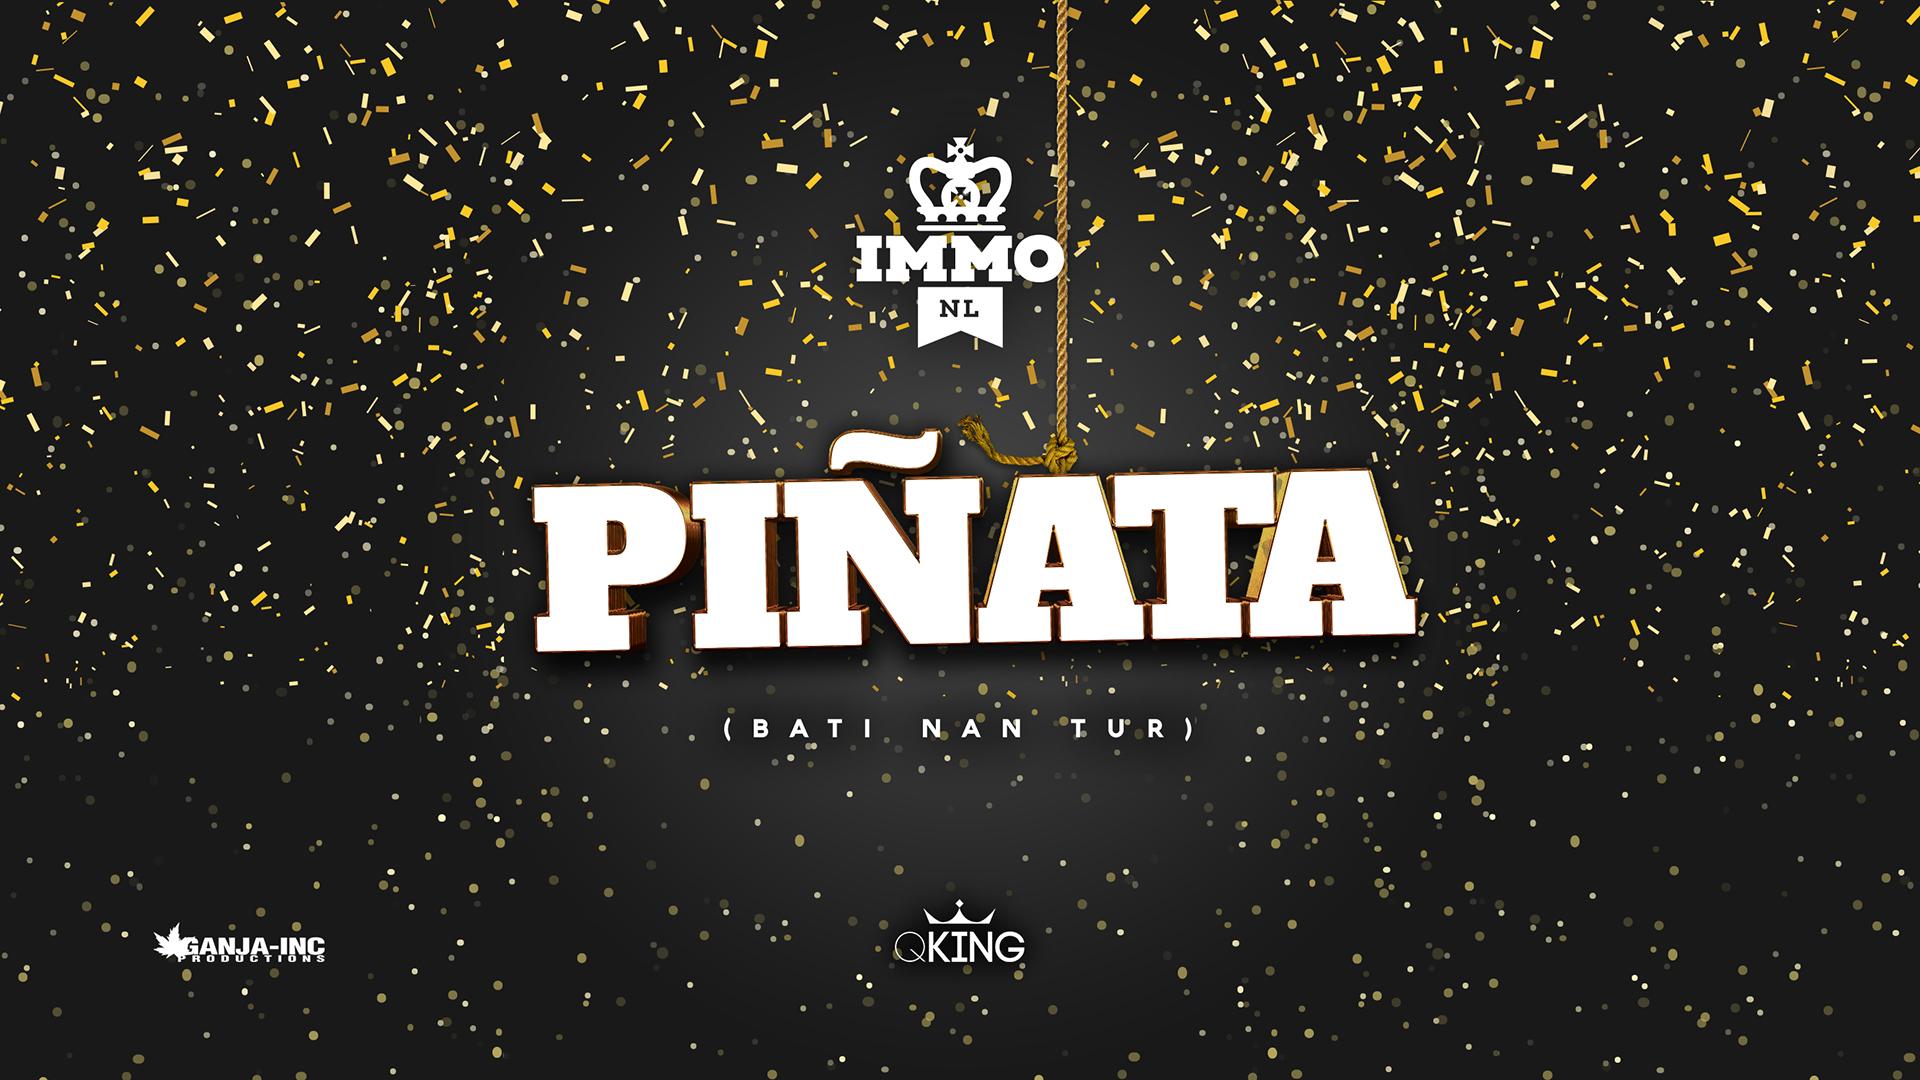 IMMO – Piñata (Bati Nan Tur)